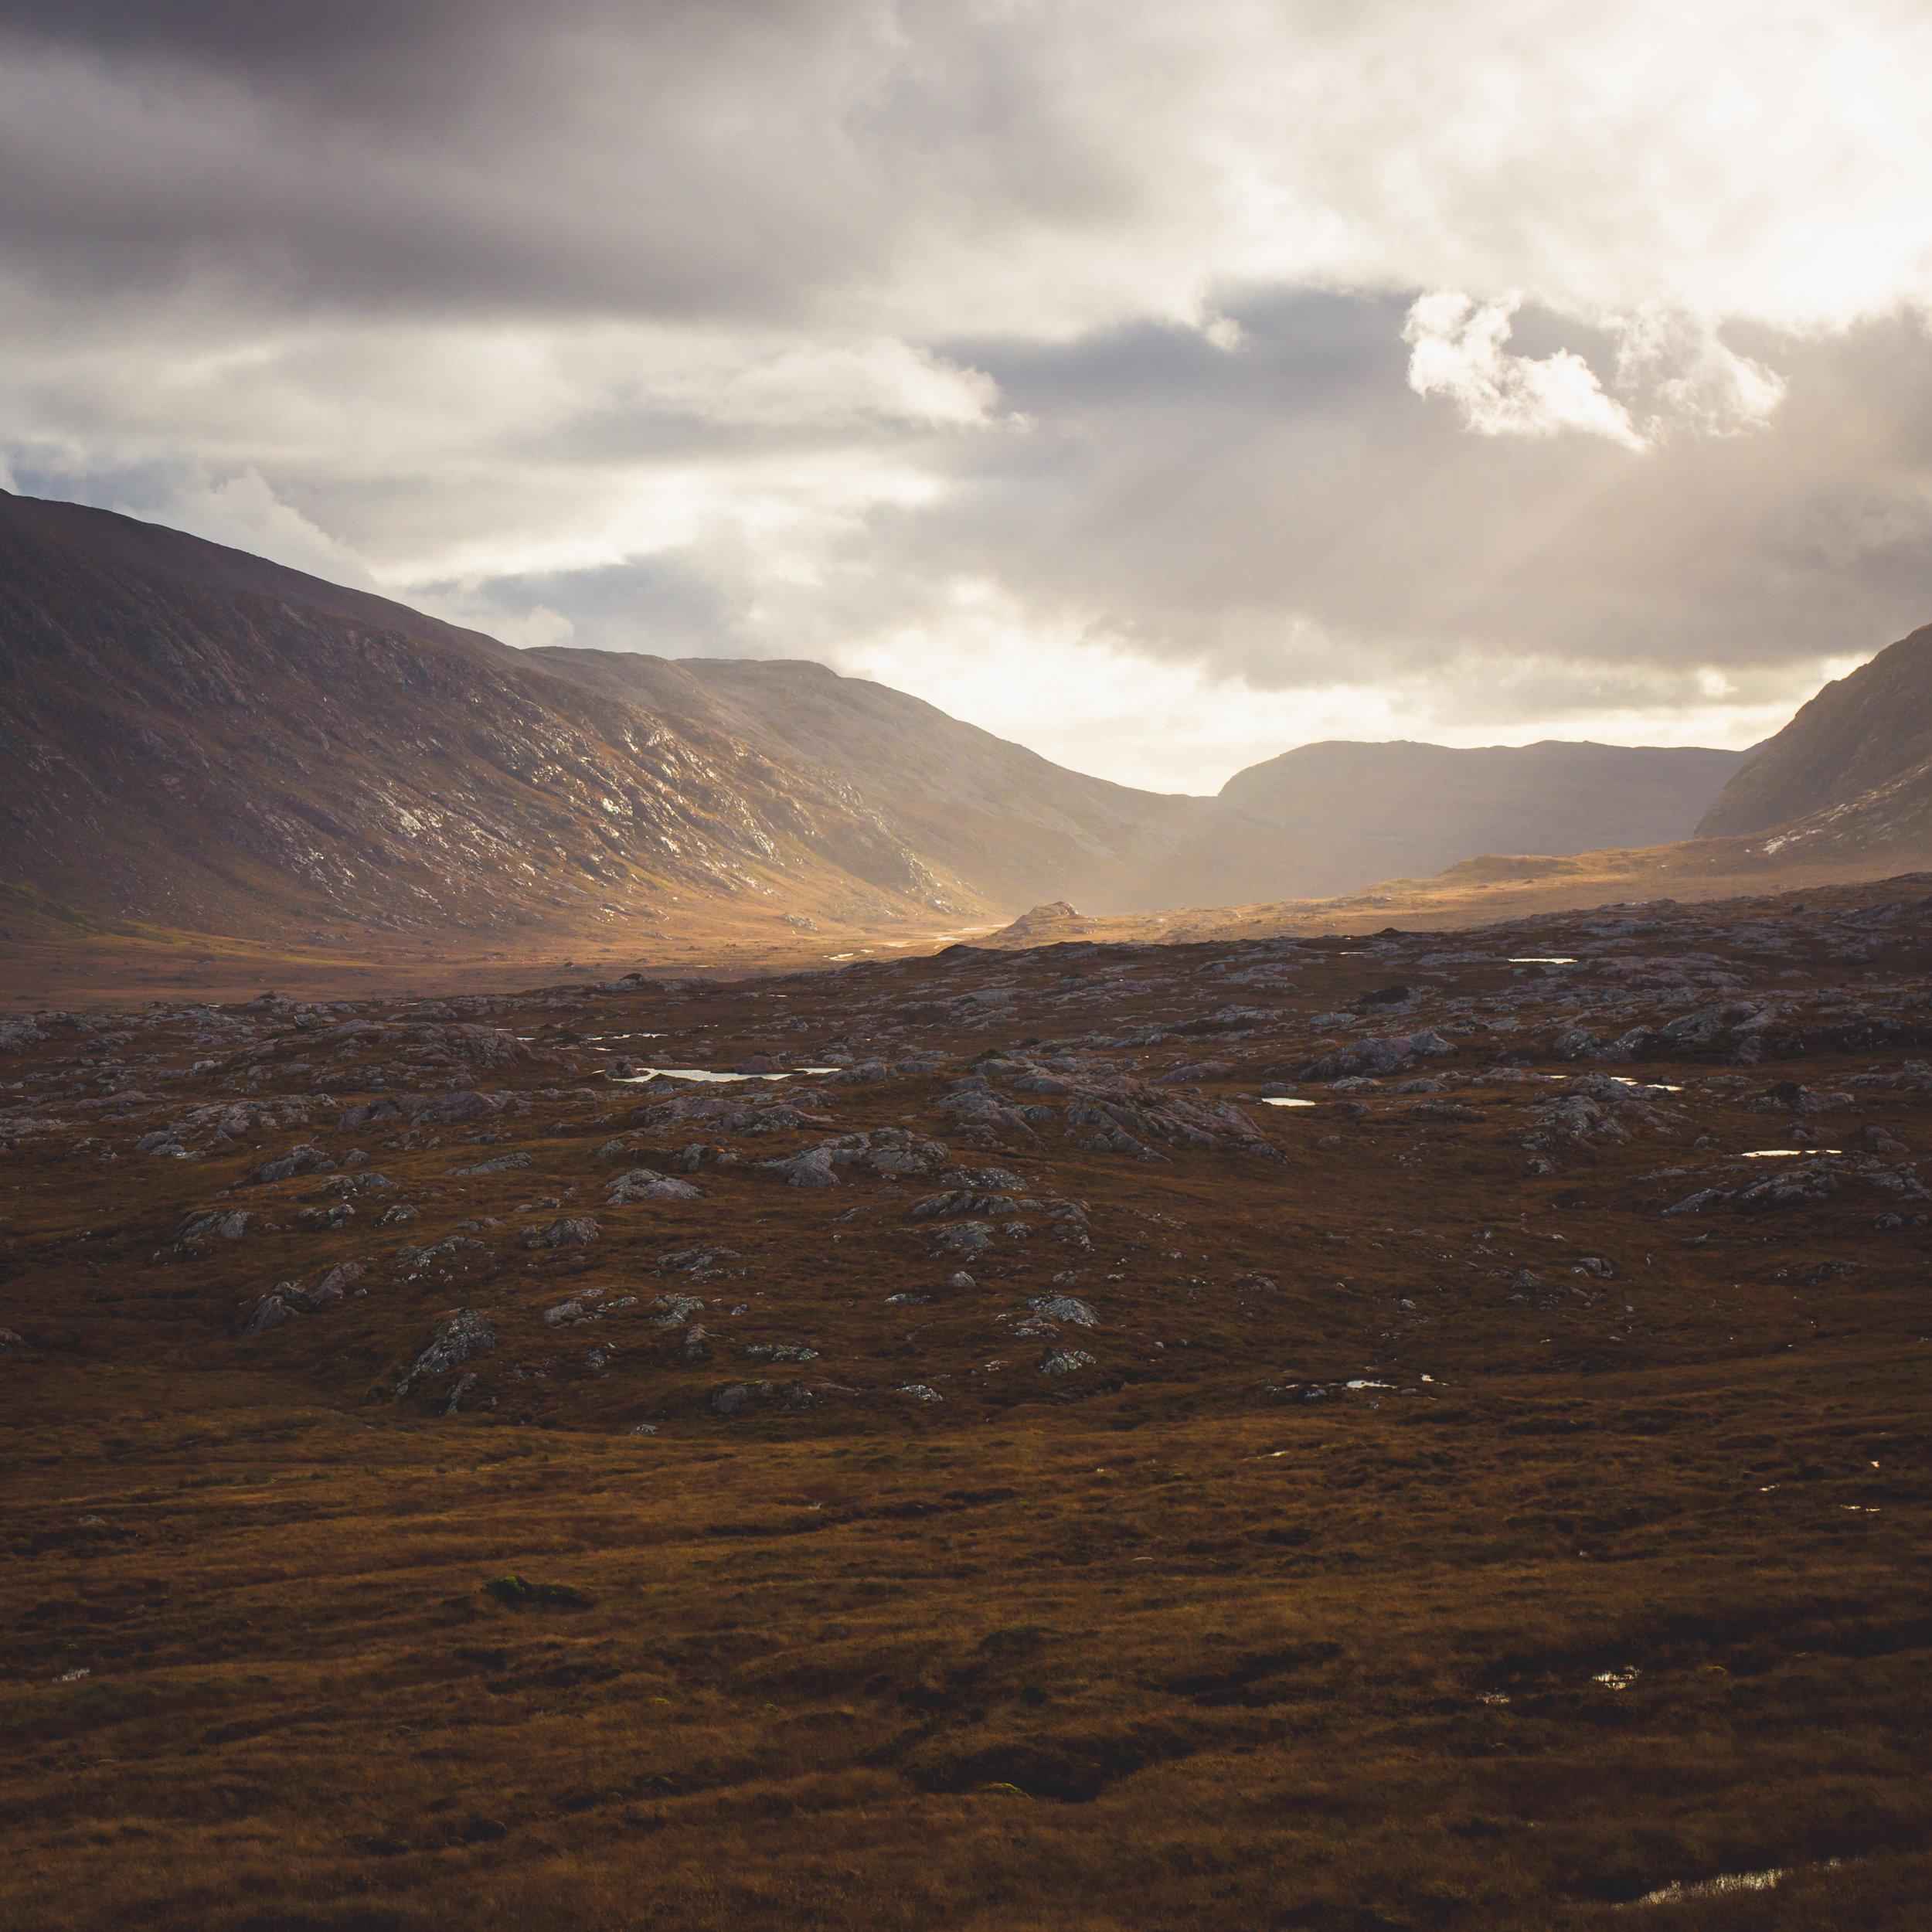 Fraser_Taylor_Scotland-55.jpg